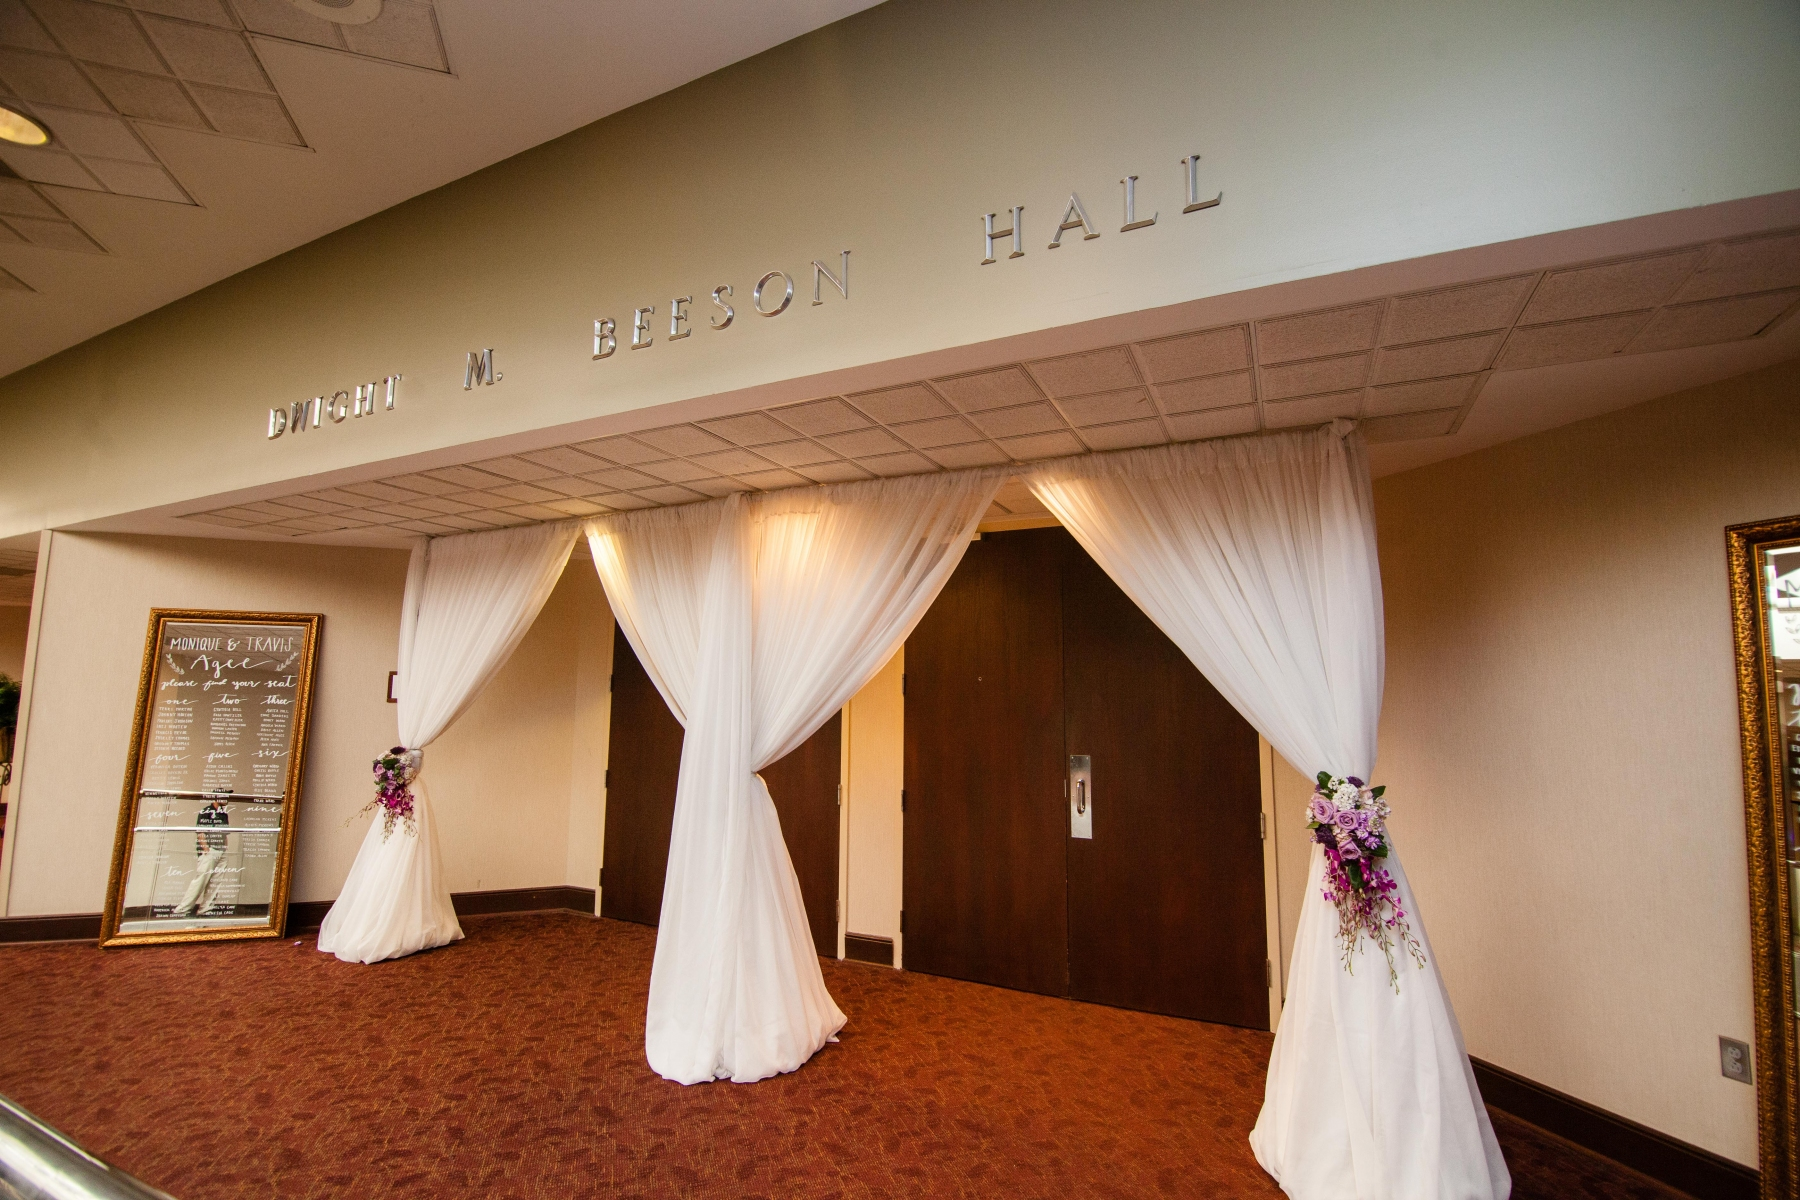 Doors to Beeson Hall